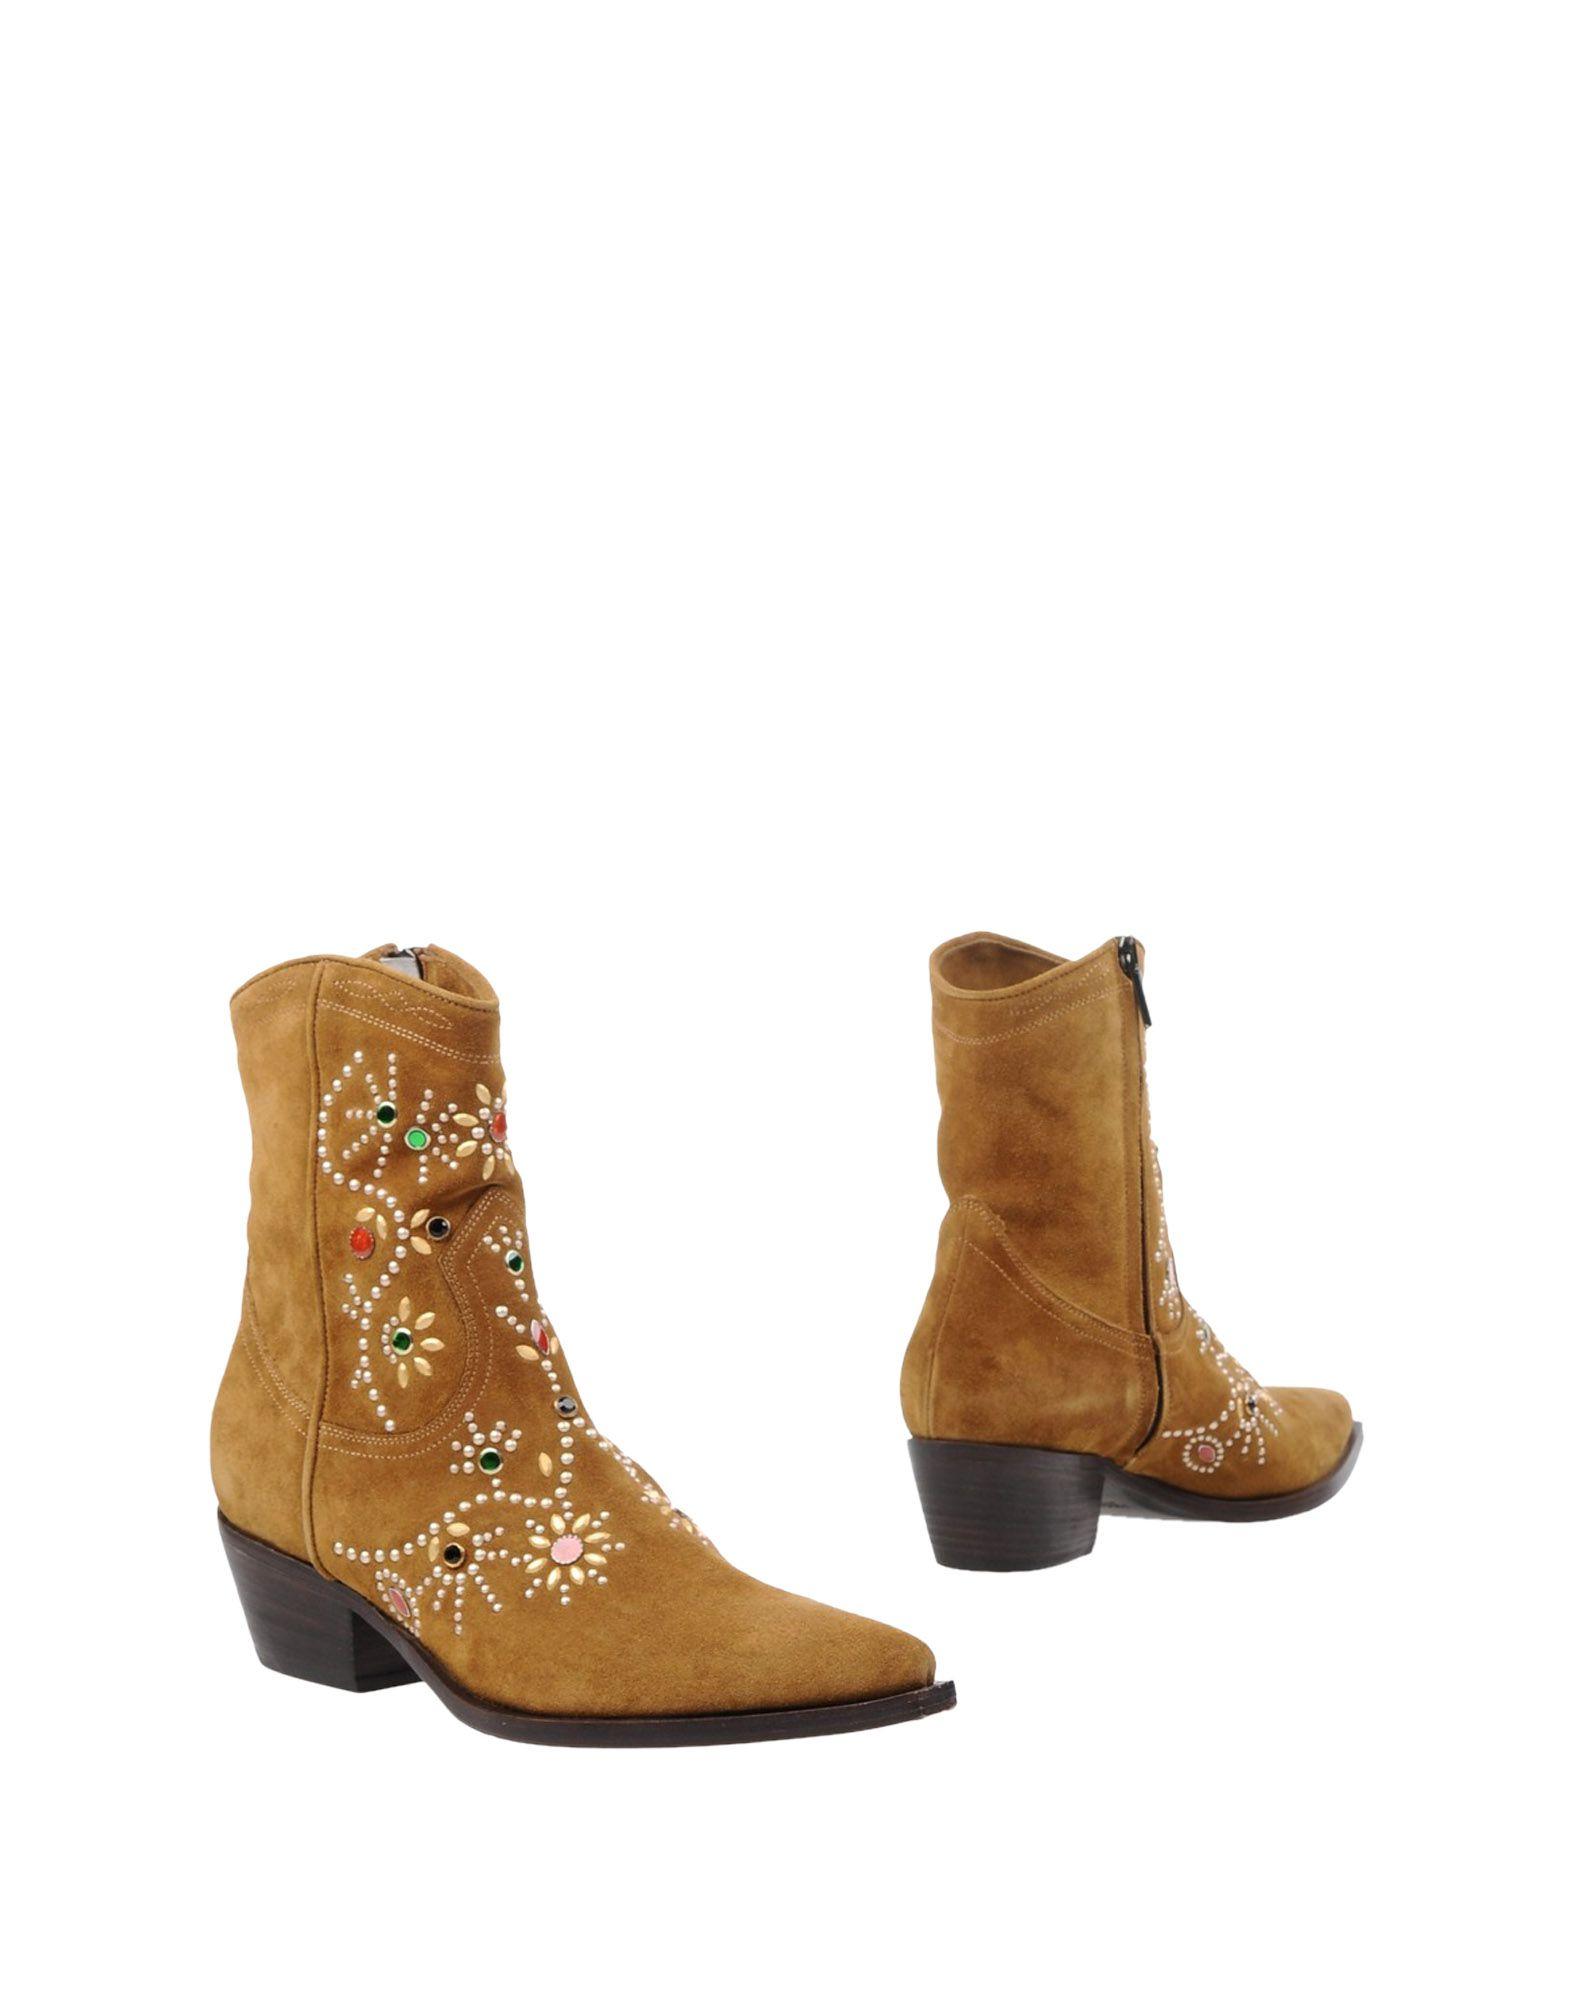 Luca Luca Luca Valentini Stiefelette Damen  11363531AR Gute Qualität beliebte Schuhe 5c008c